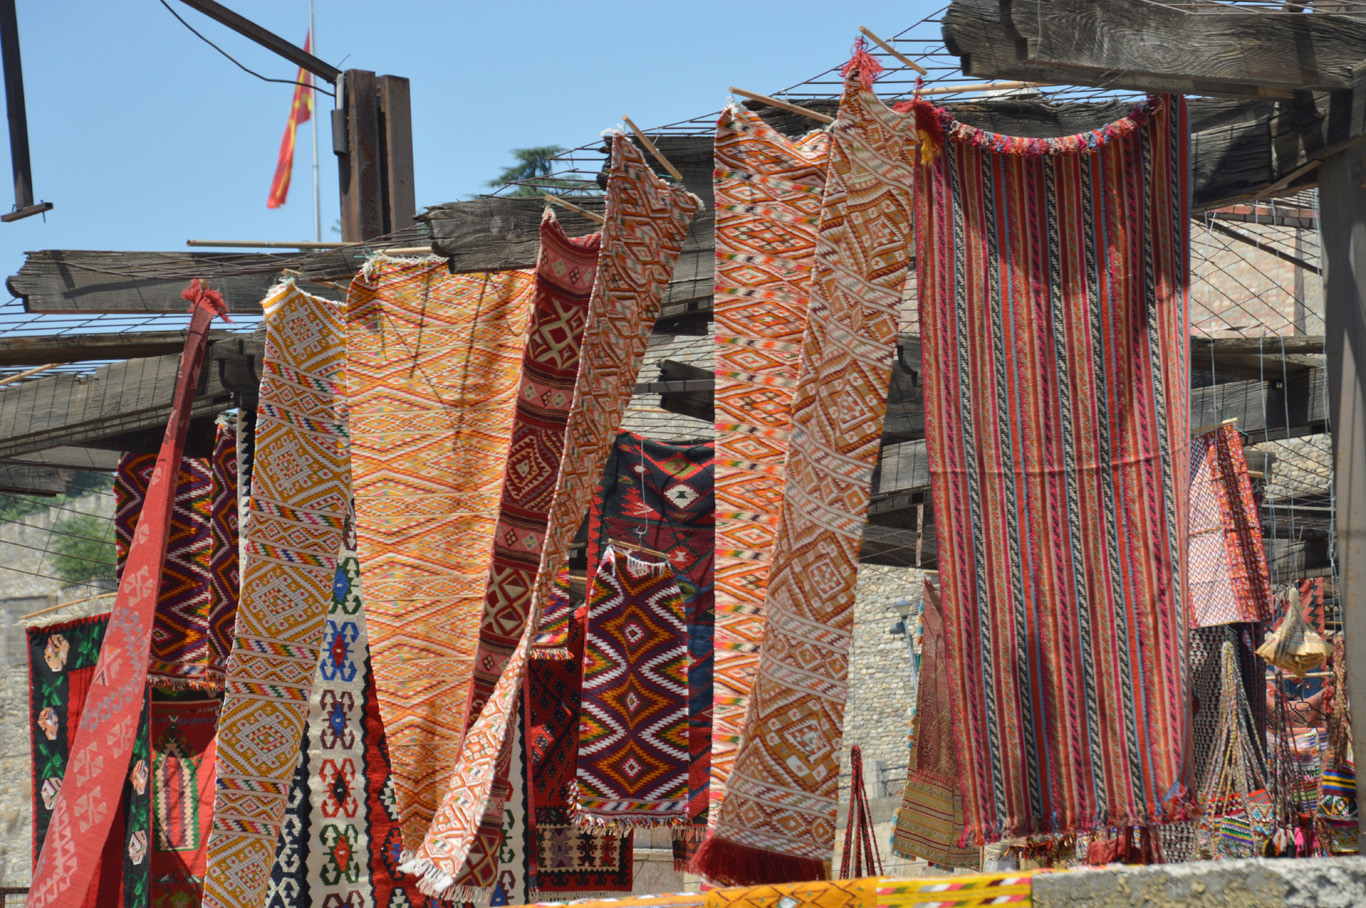 Carpets in the Old Bazaar